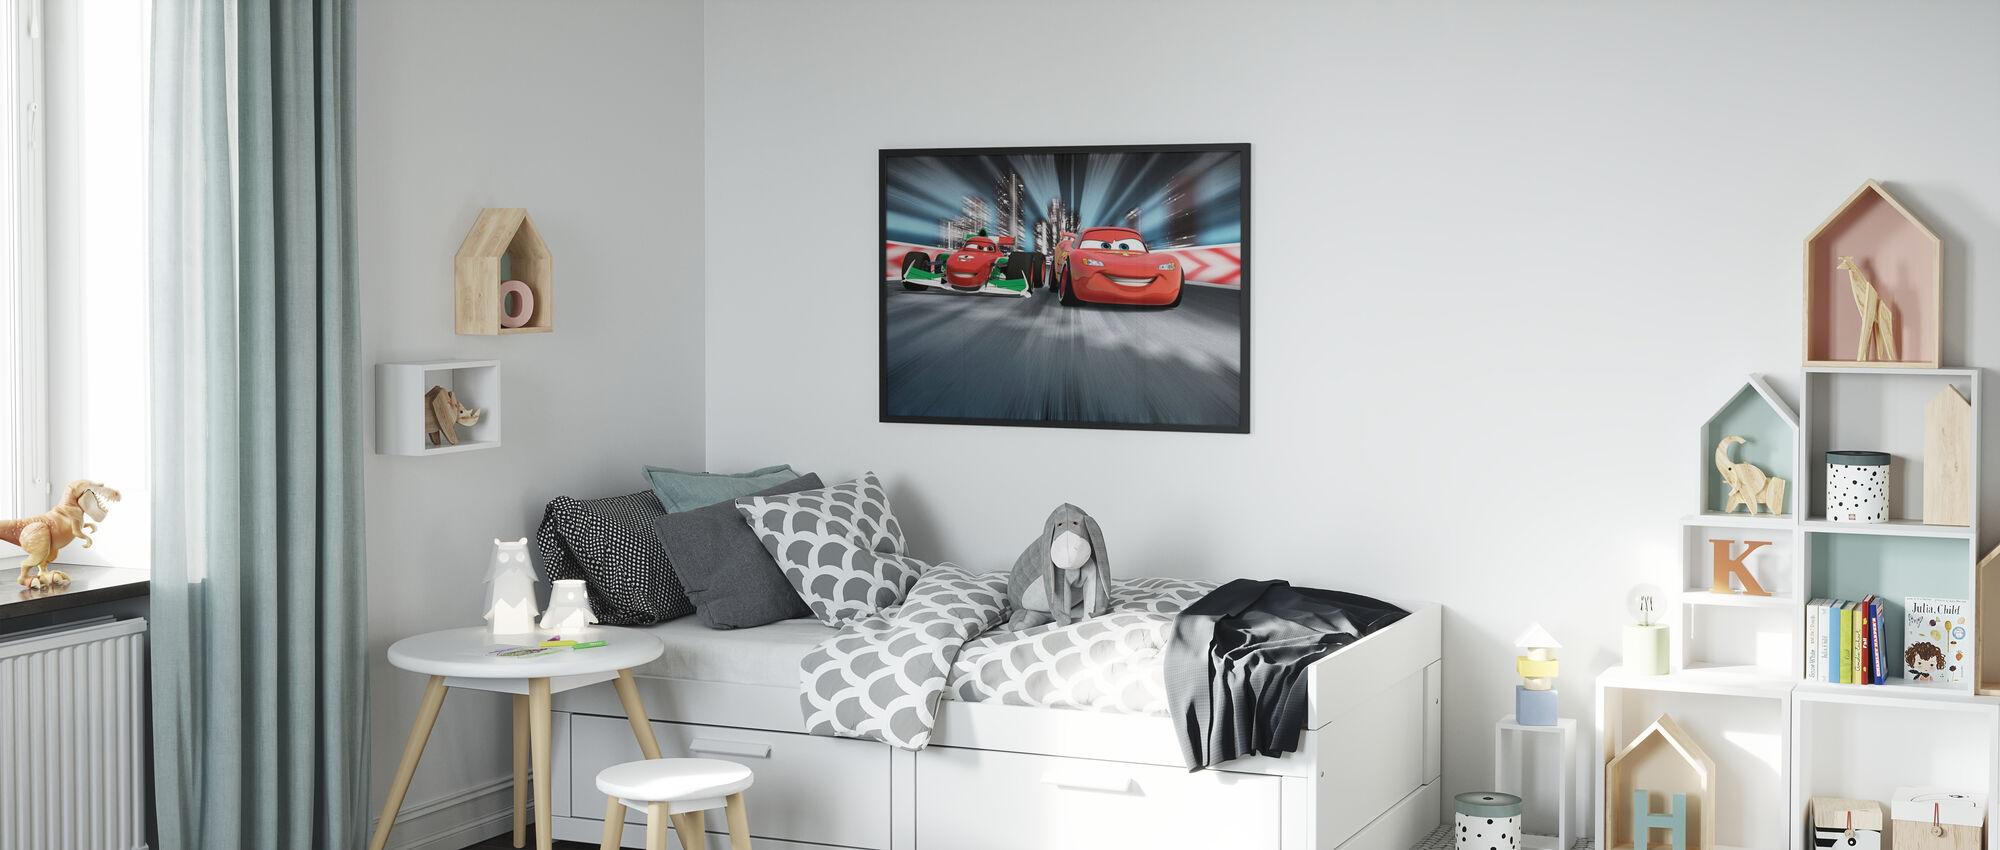 Francesco Bernoulli lyn McQueen - Innrammet bilde - Barnerom